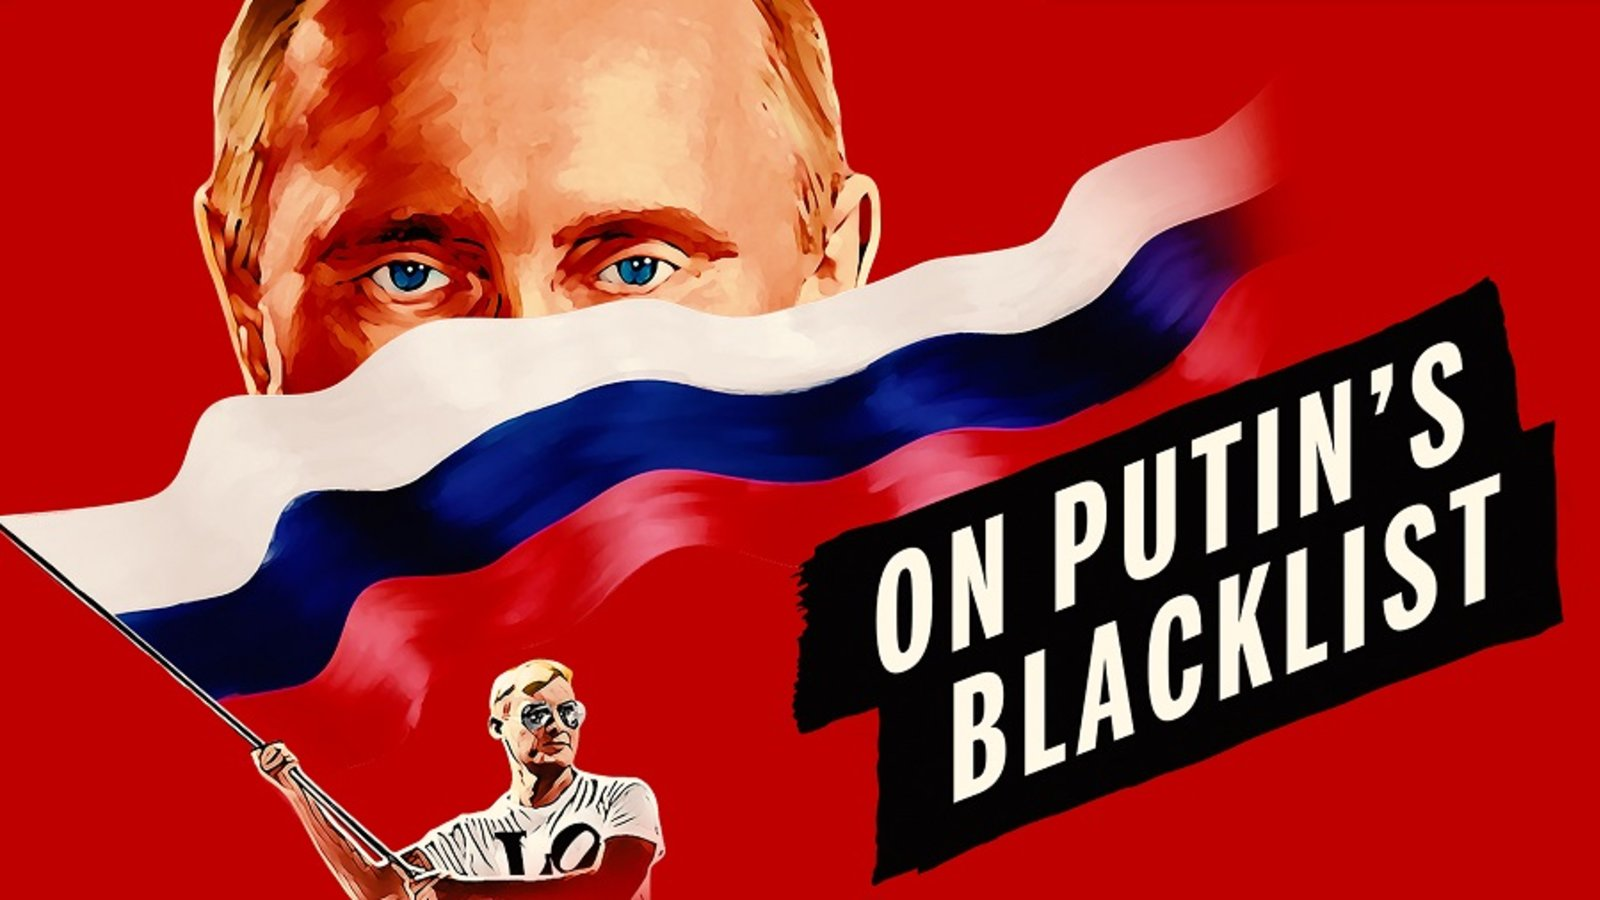 On Putin's Blacklist - Human Rights at Risk in Putin's Russia